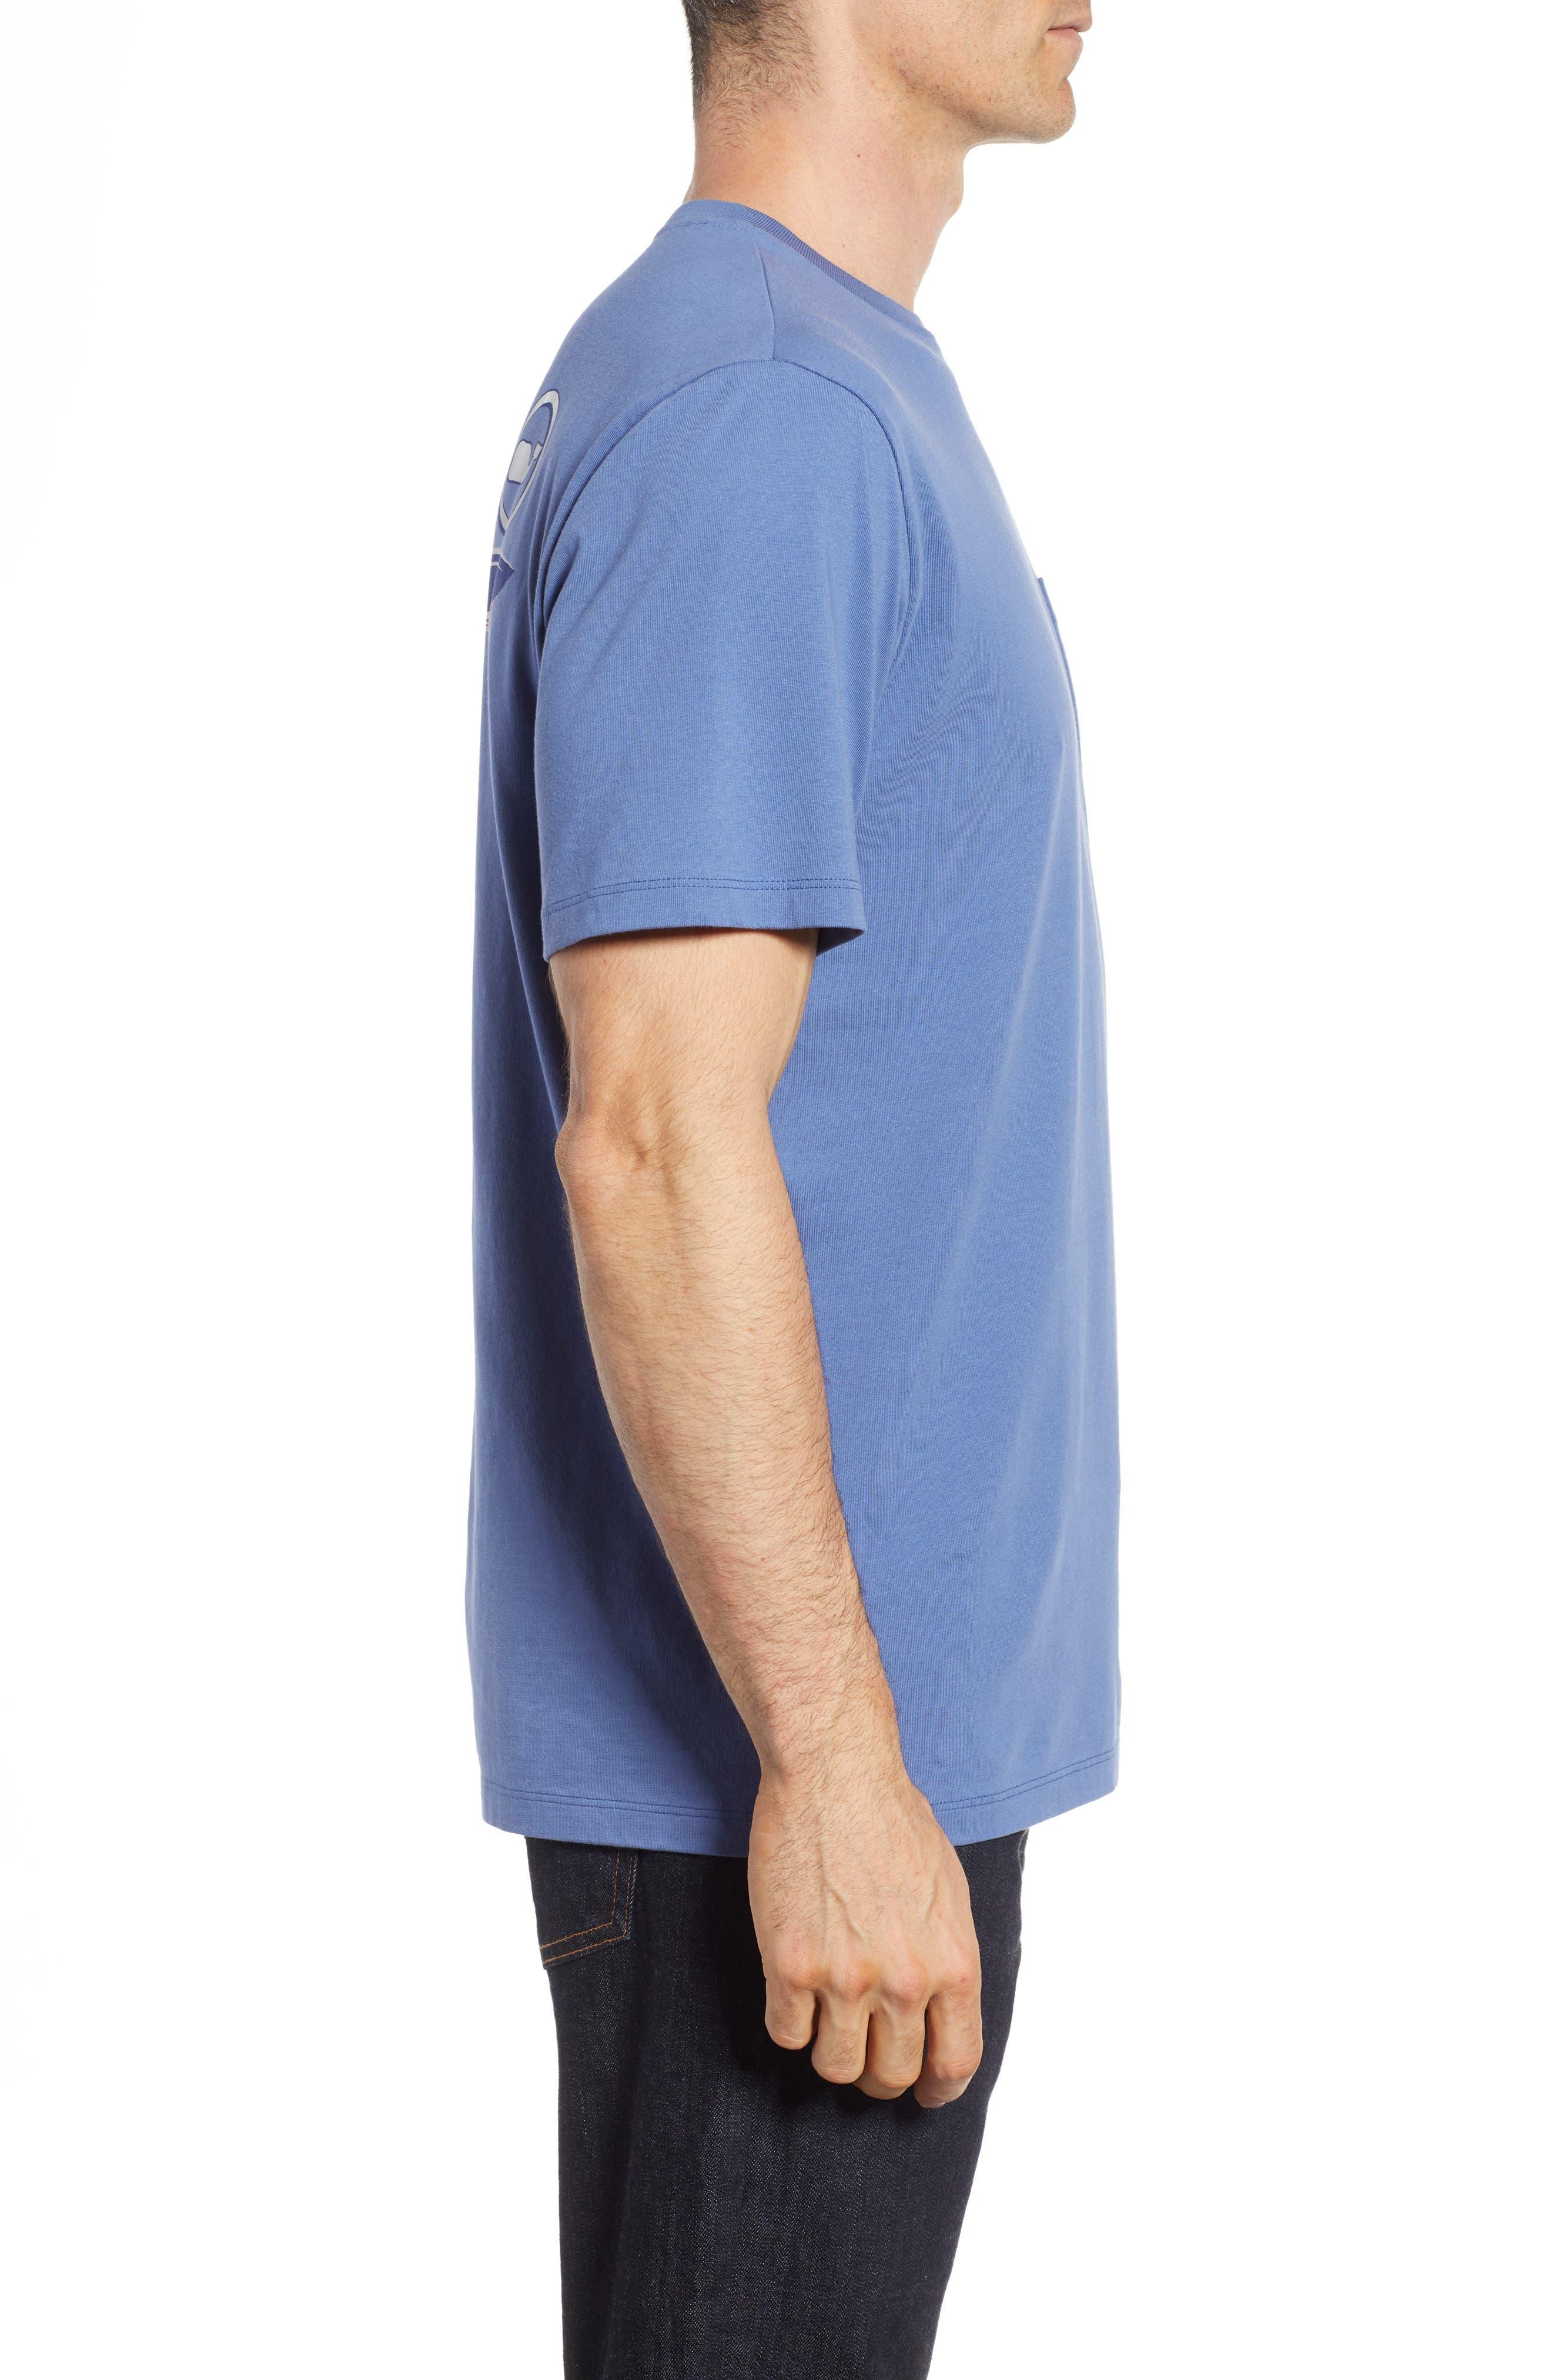 American Sportfisher T-Shirt,                             Alternate thumbnail 3, color,